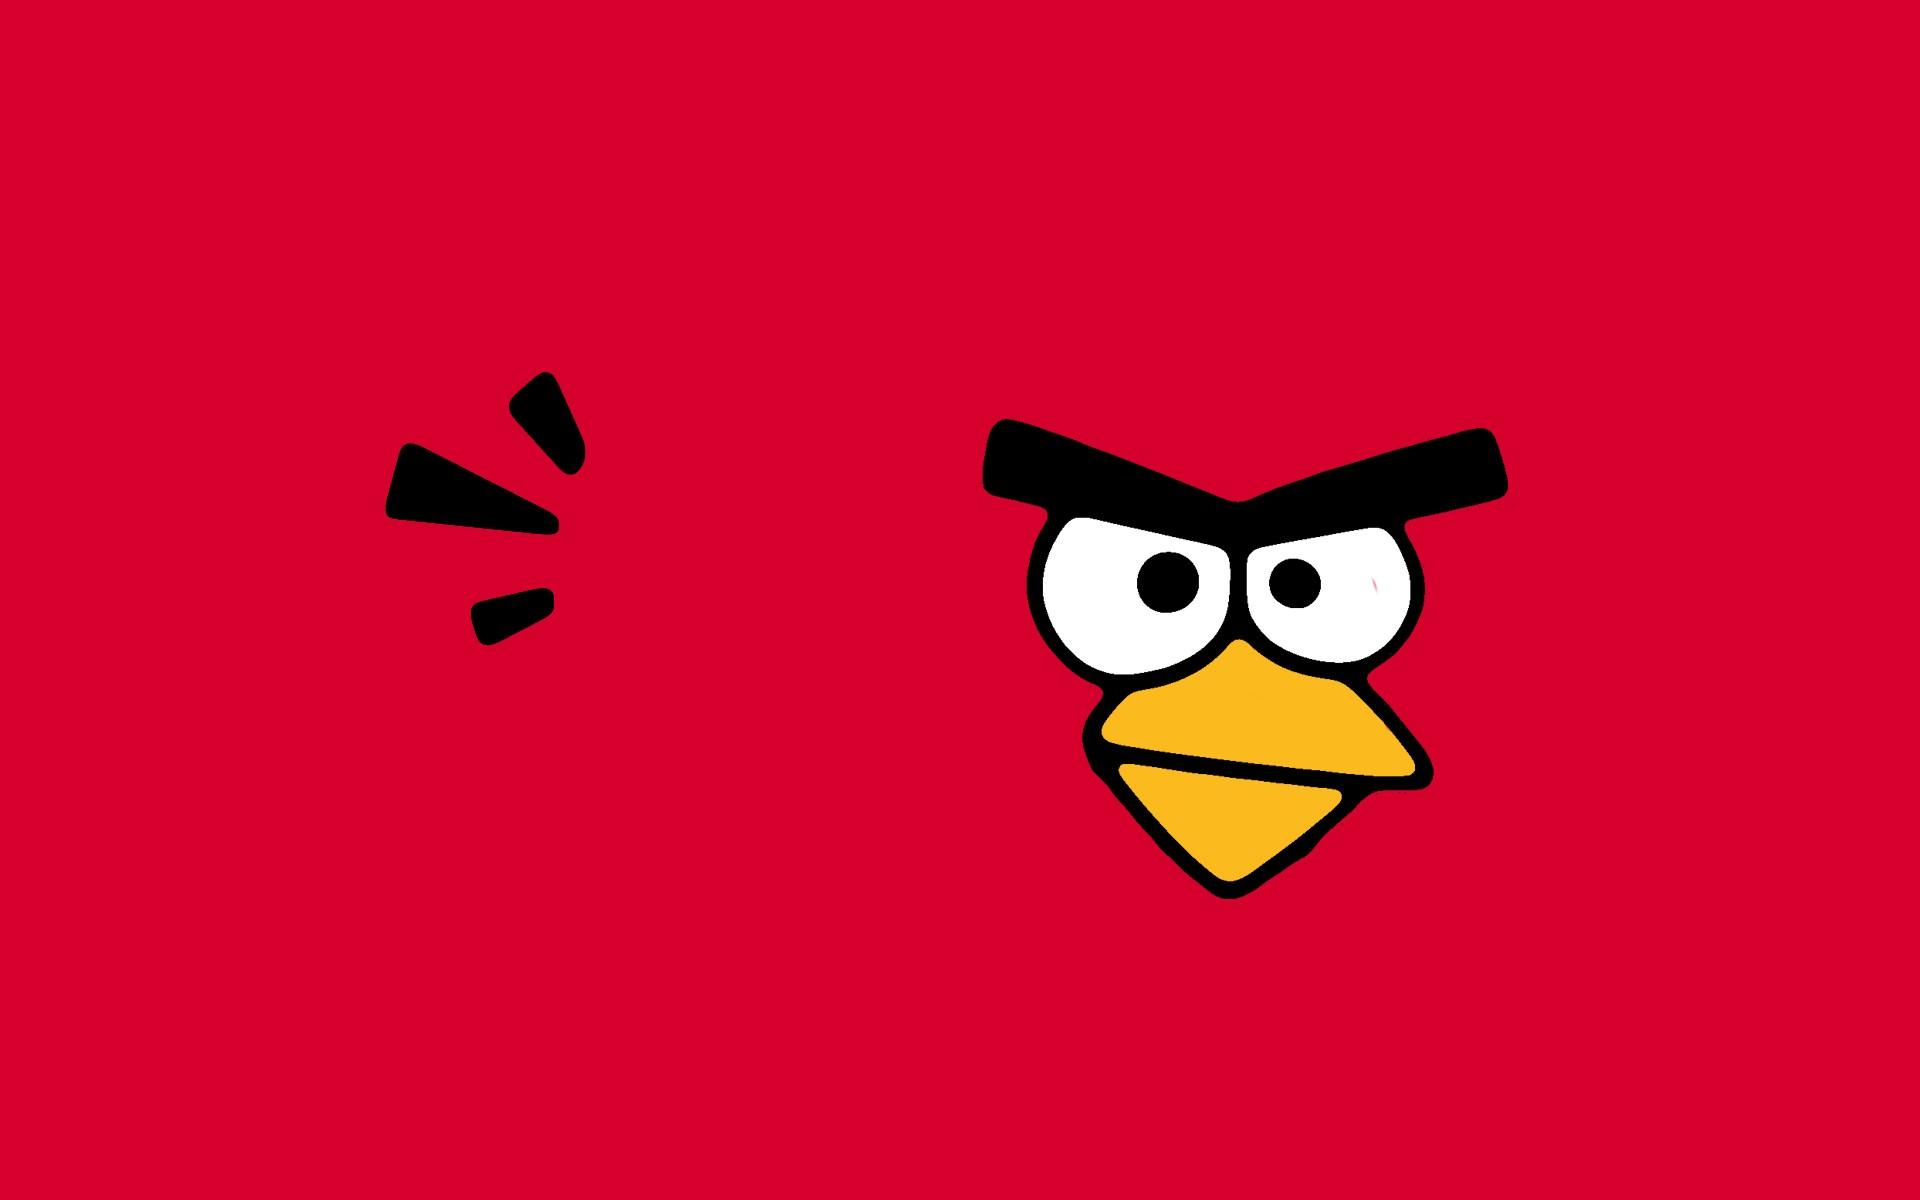 angry-birds-http-saqibsomal-com-shakira-is-coming-to-angry-birds-angry-birds-wallpaper-wp3402403